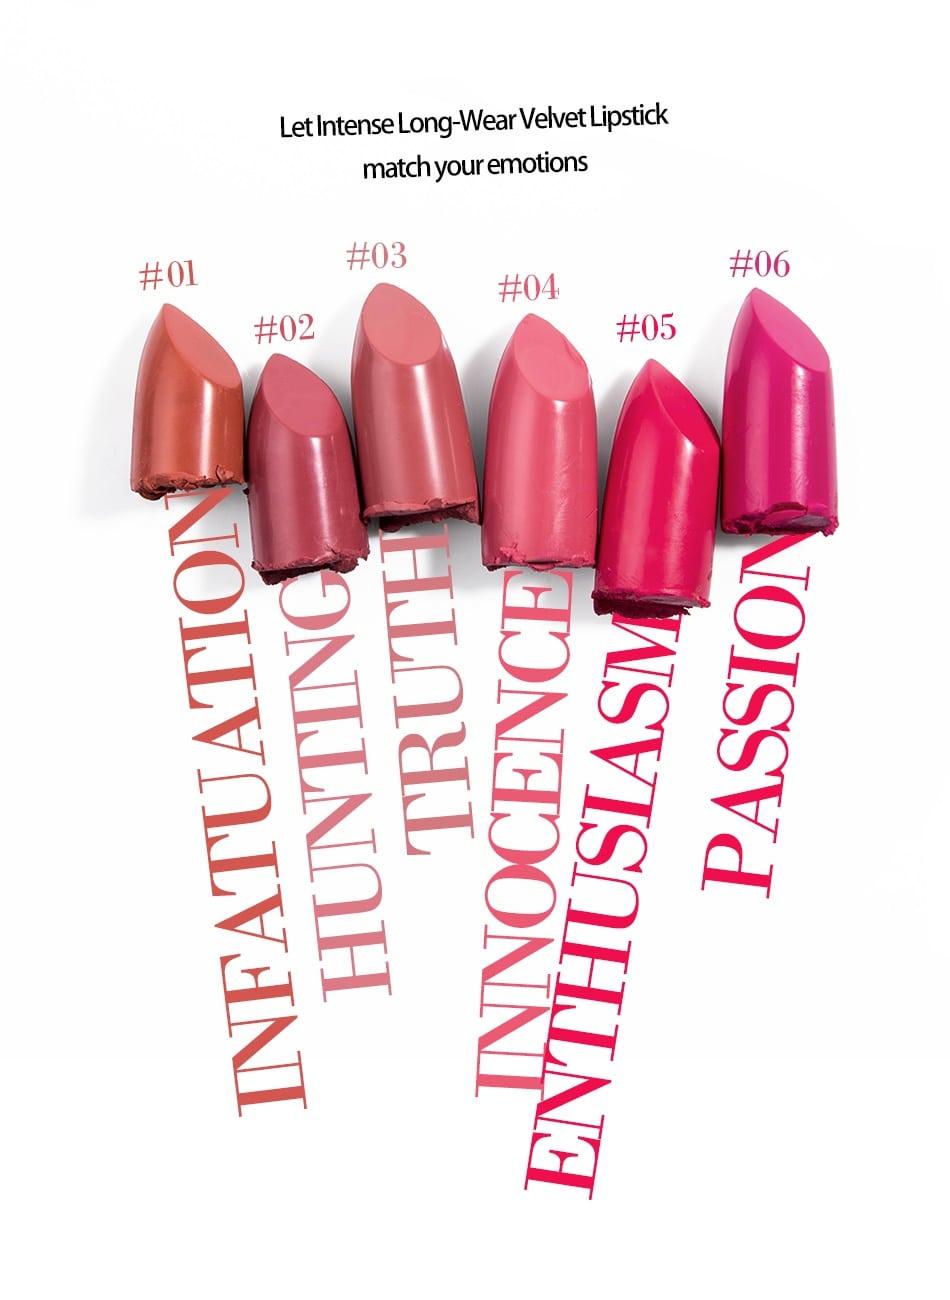 Long-Wear Velvet Lipstick - Product Colors 02